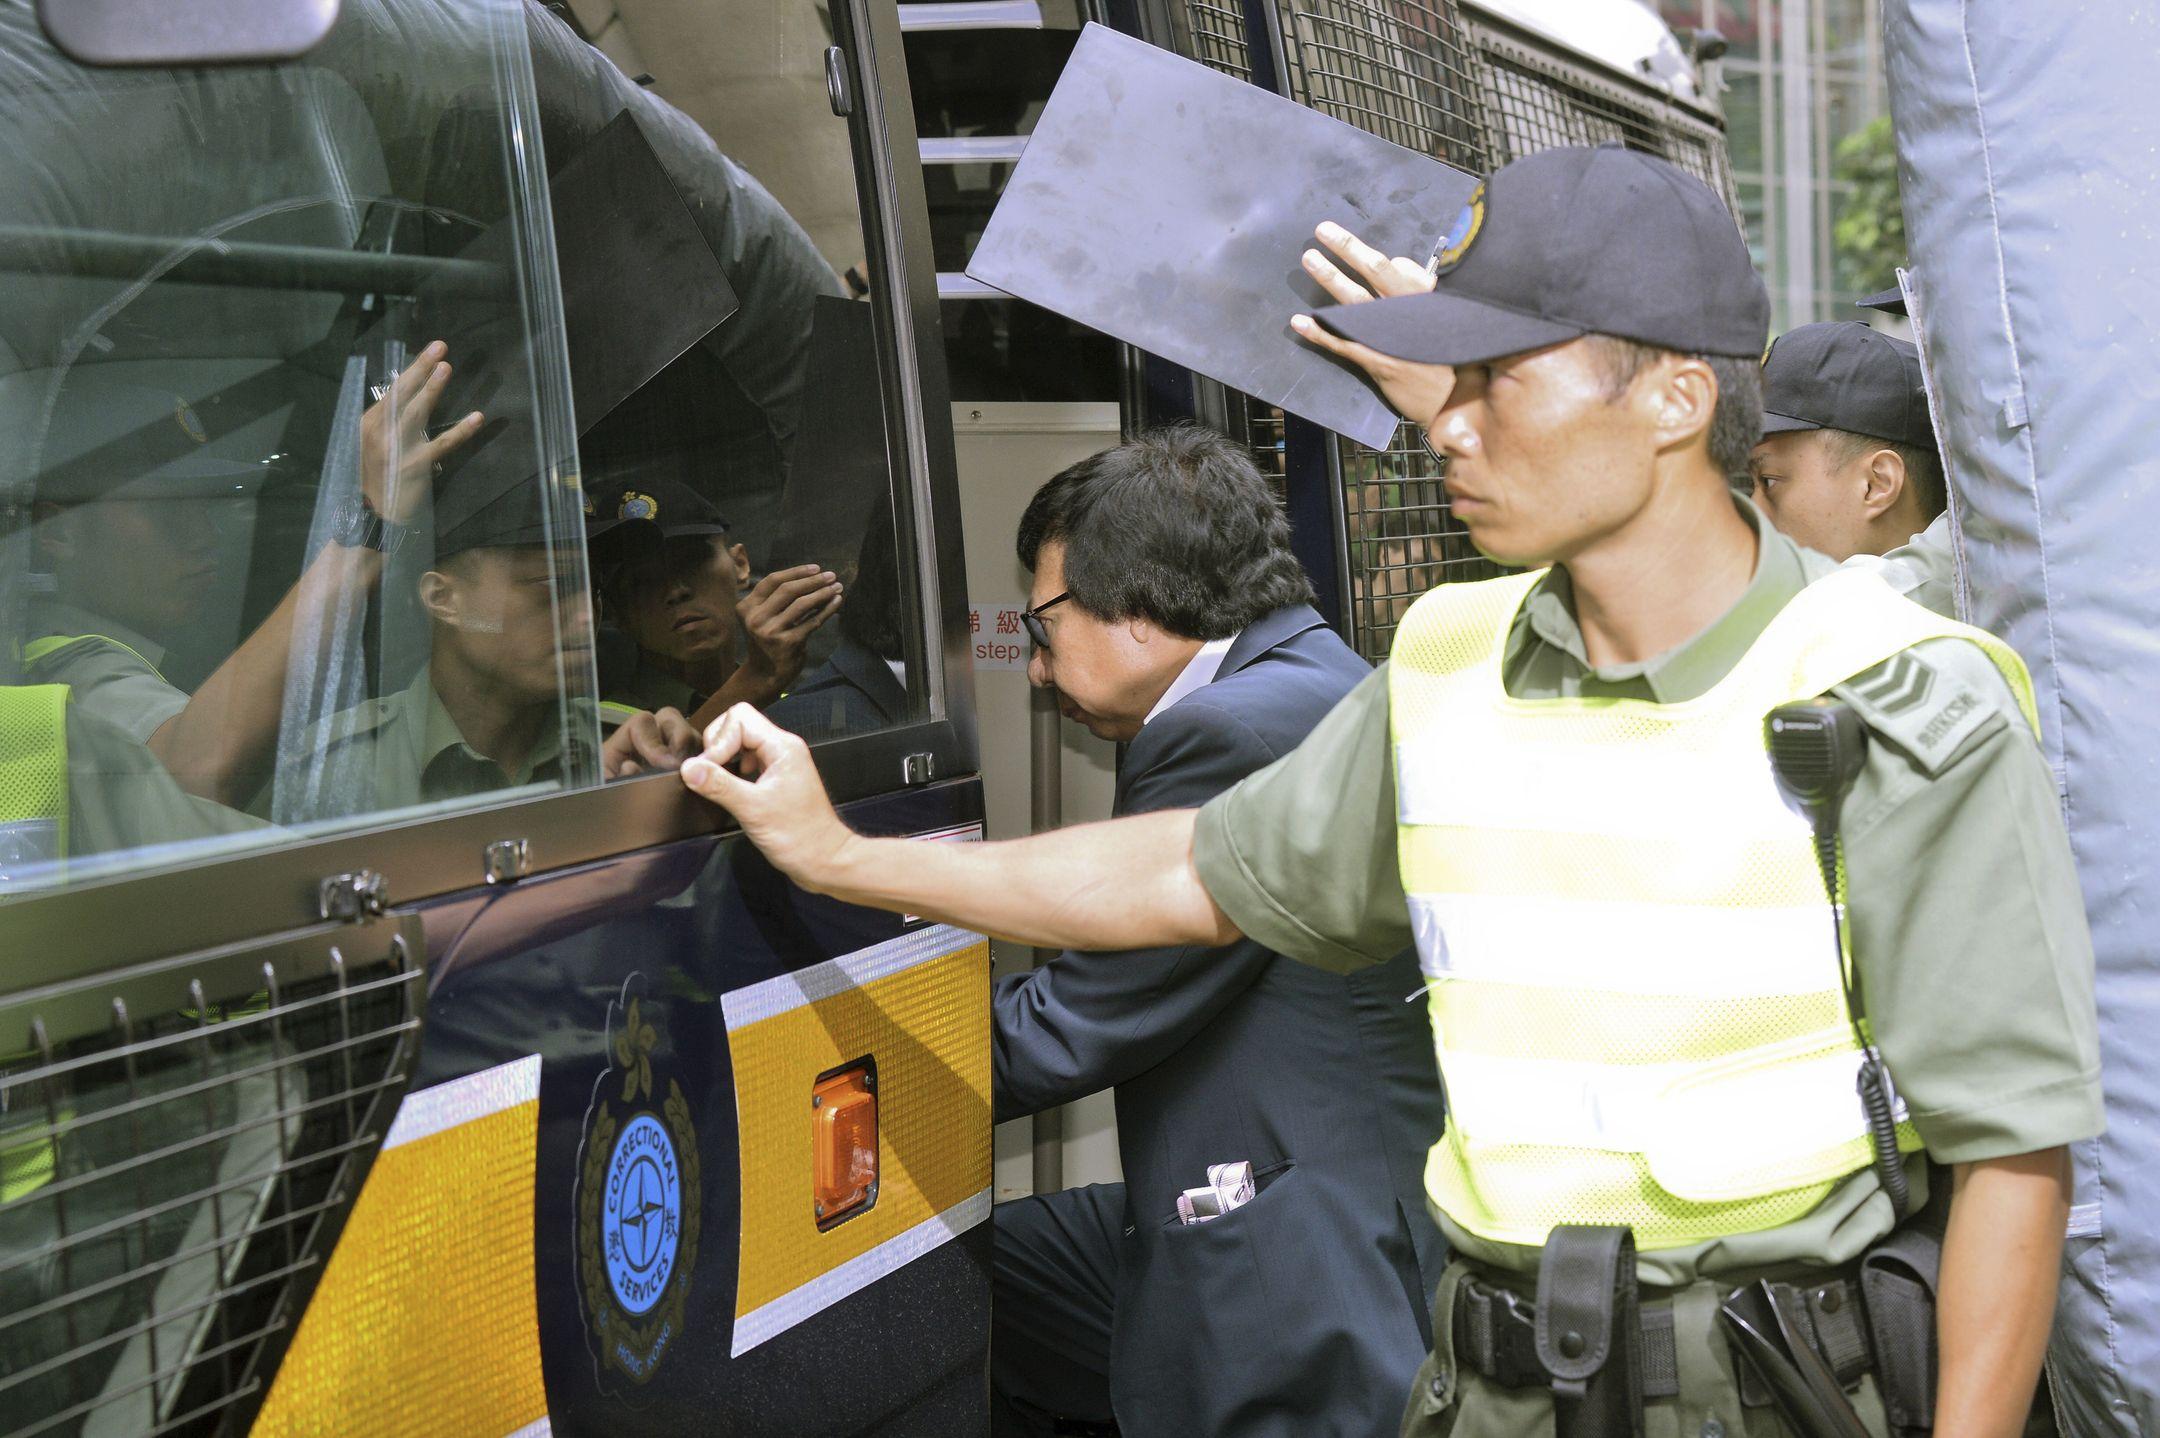 Jury picked for corruption trial of Rafael Hui & Kwok